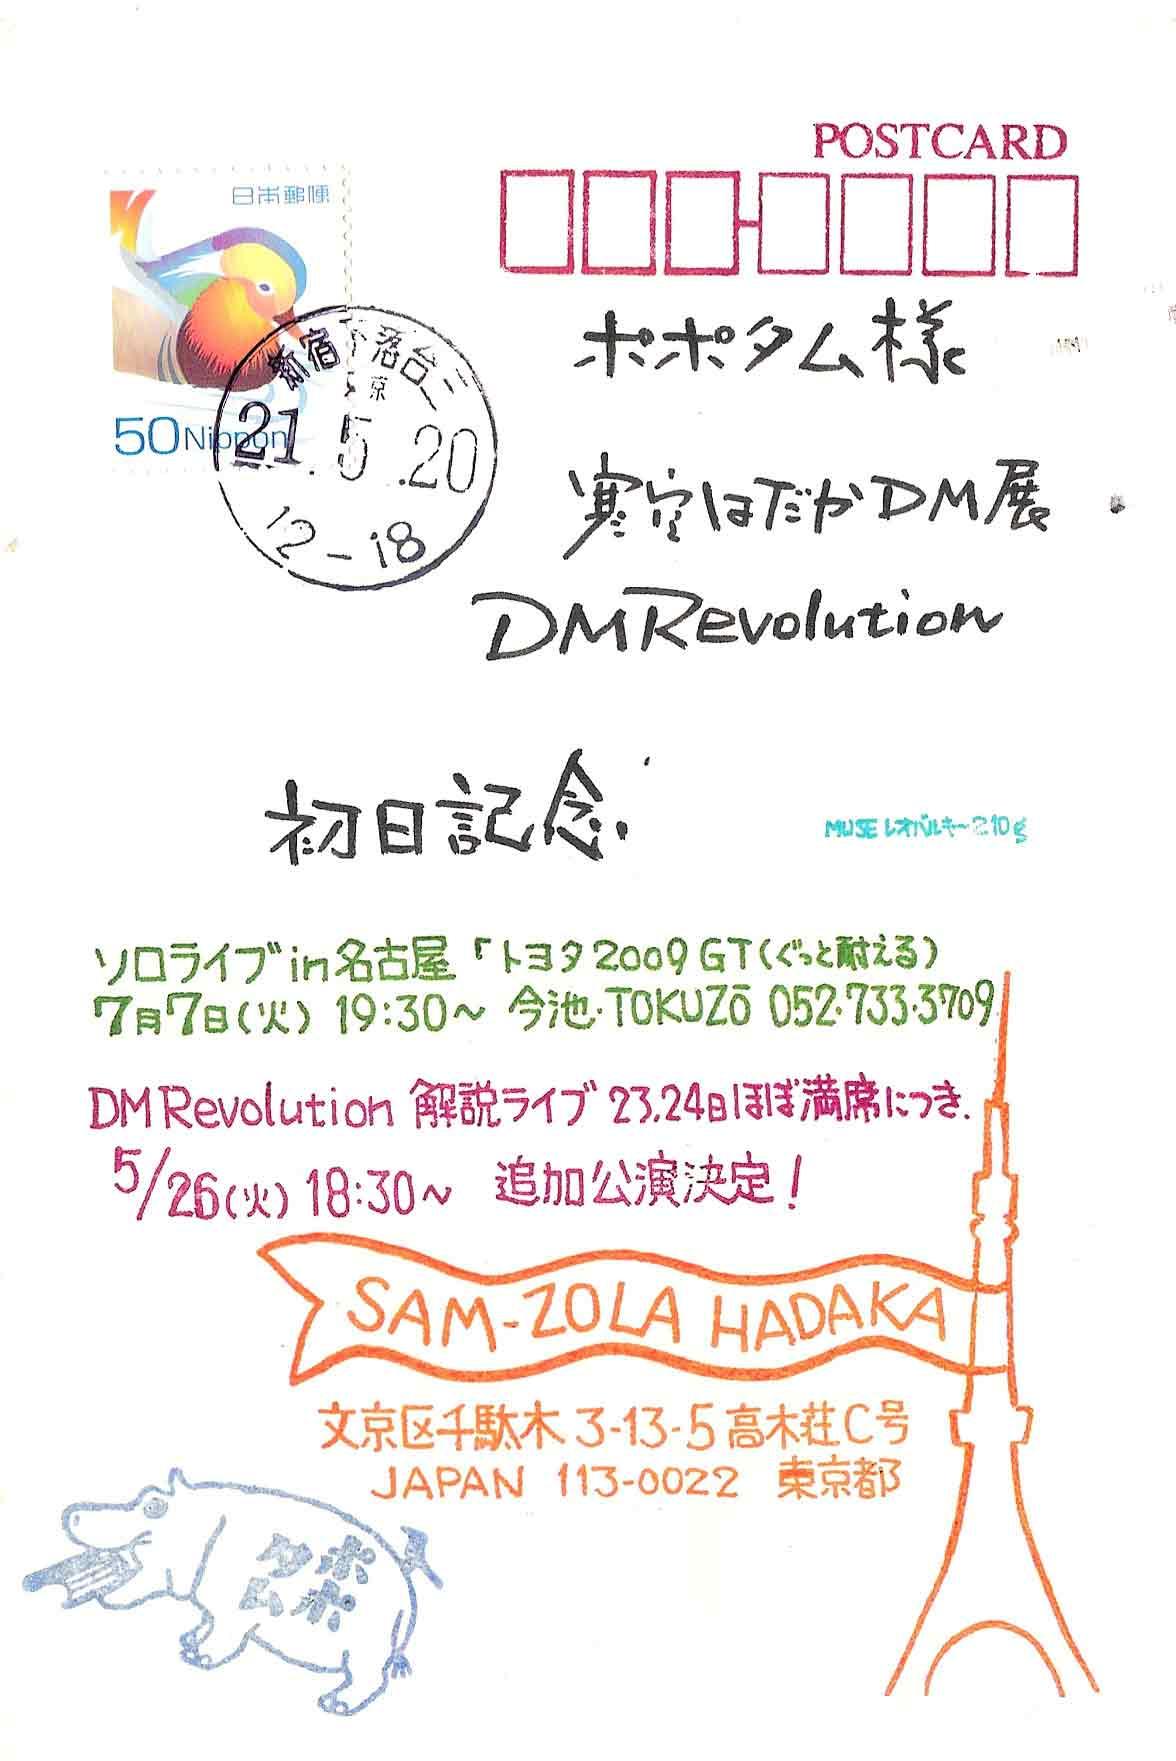 hadaka_pc1web.jpg